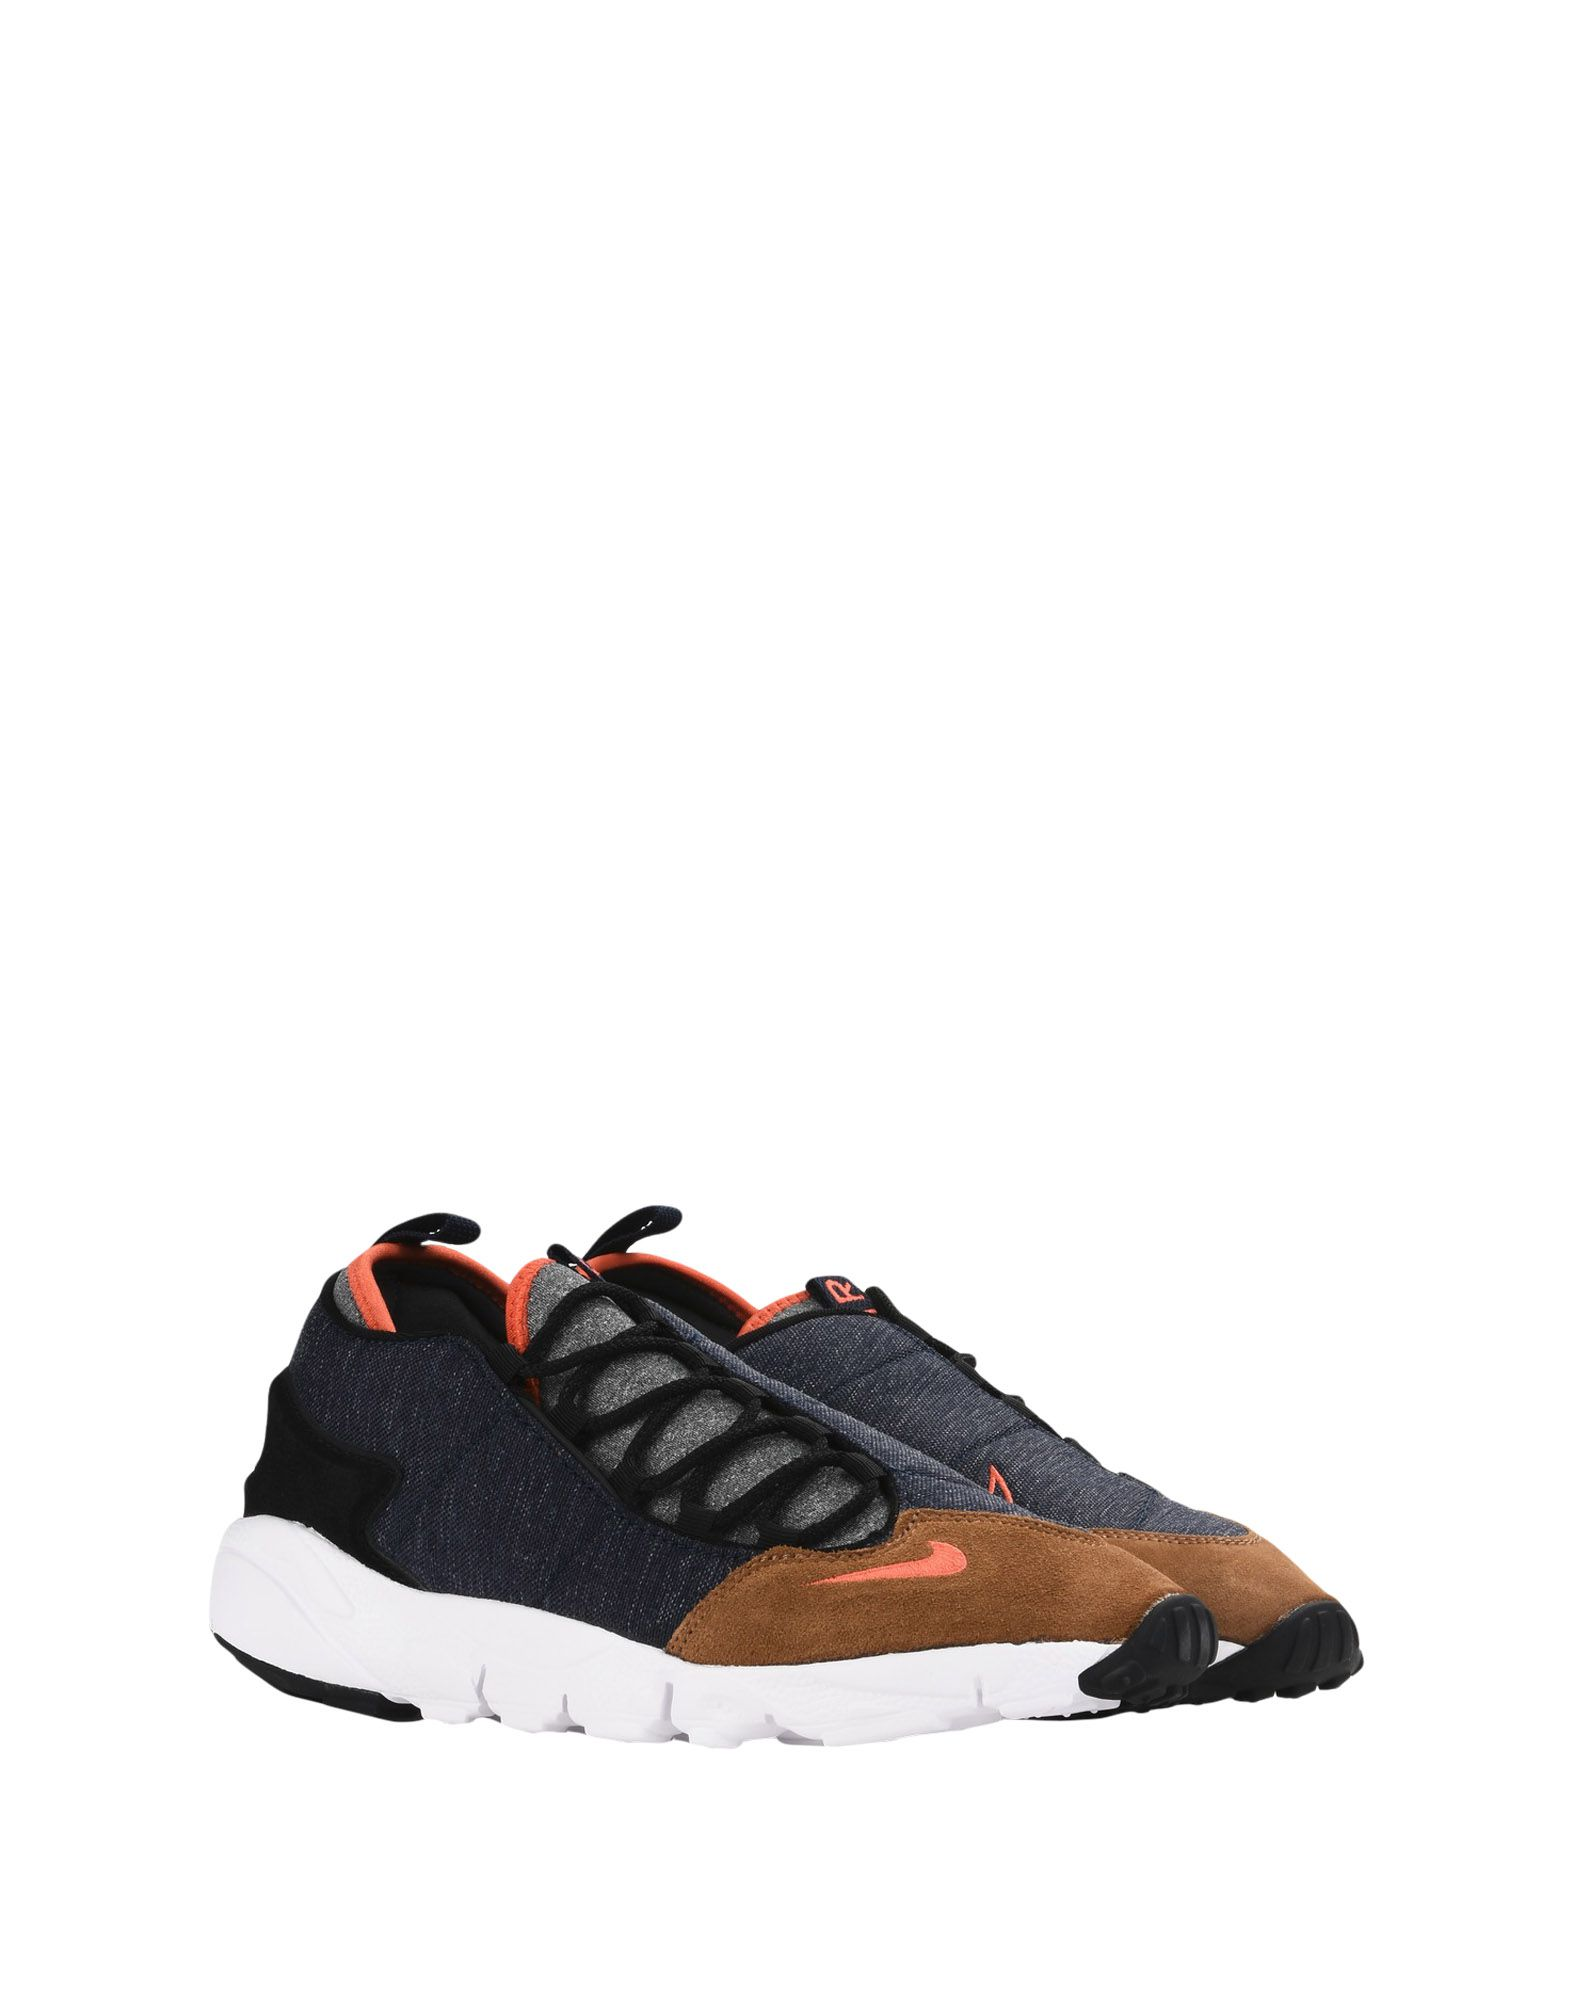 ... Sneakers Nike Air Footscape Nm - Femme - Sneakers Nike sur